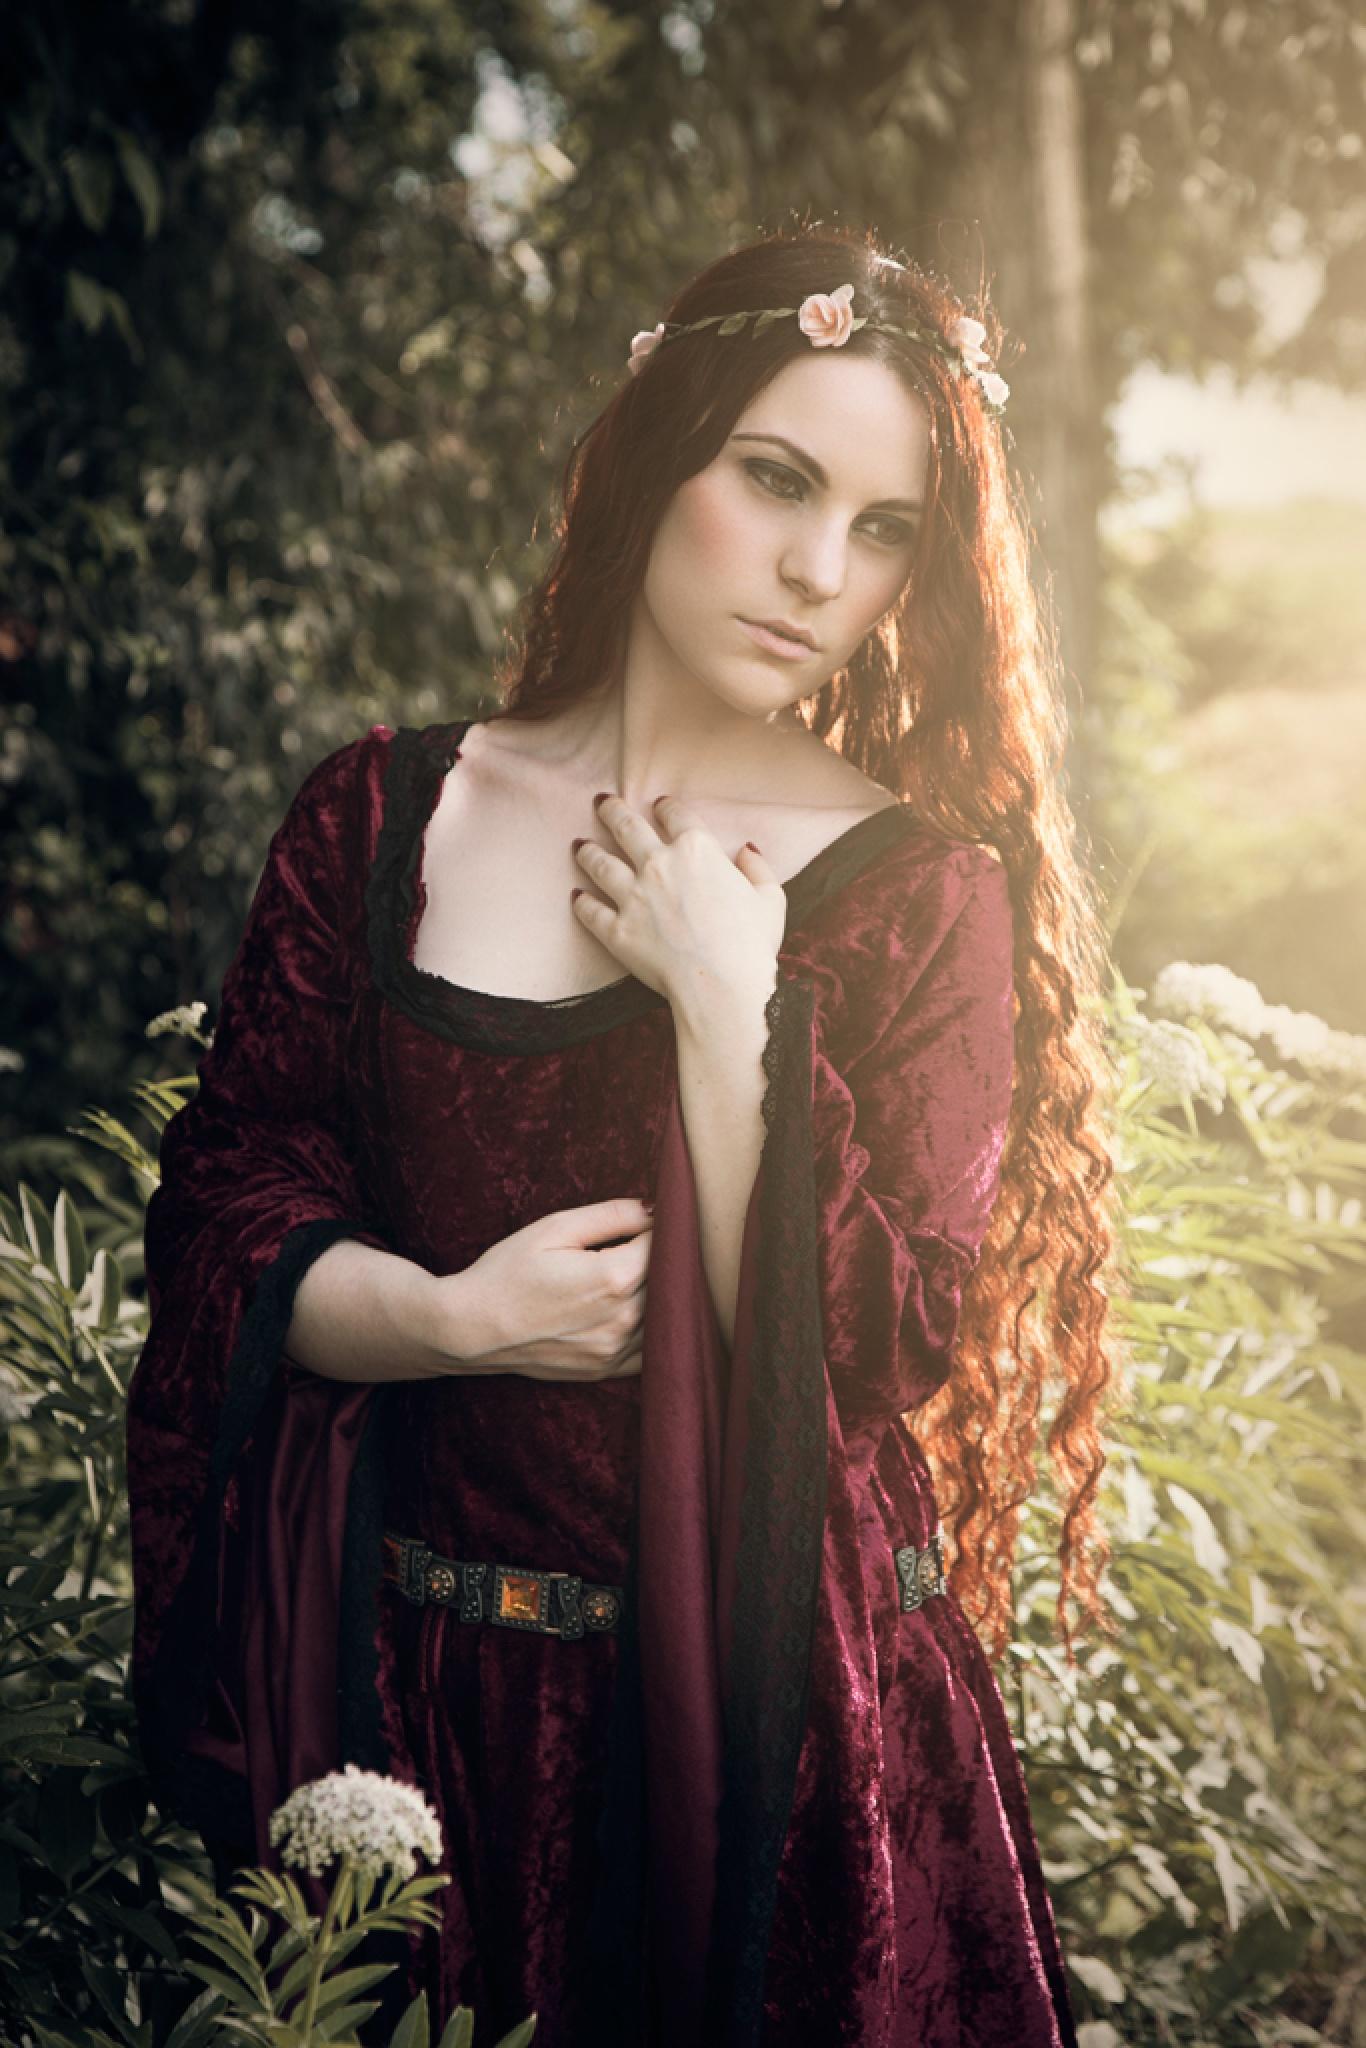 Fairy Tale by LeLe Photography